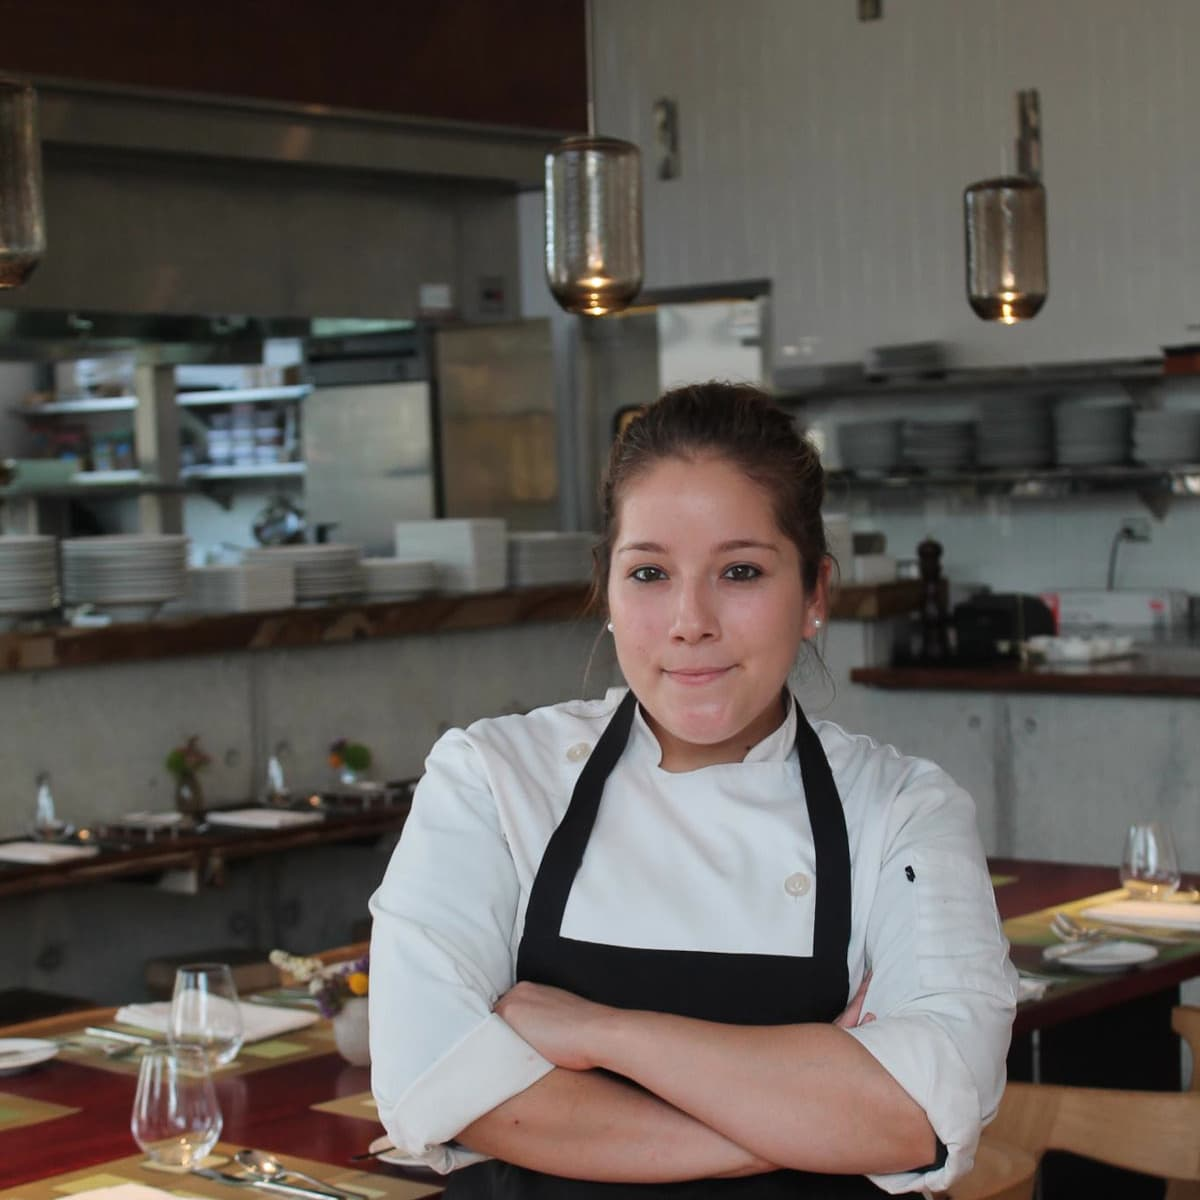 Triniti Restaurant pastry chef Samantha Mendoza